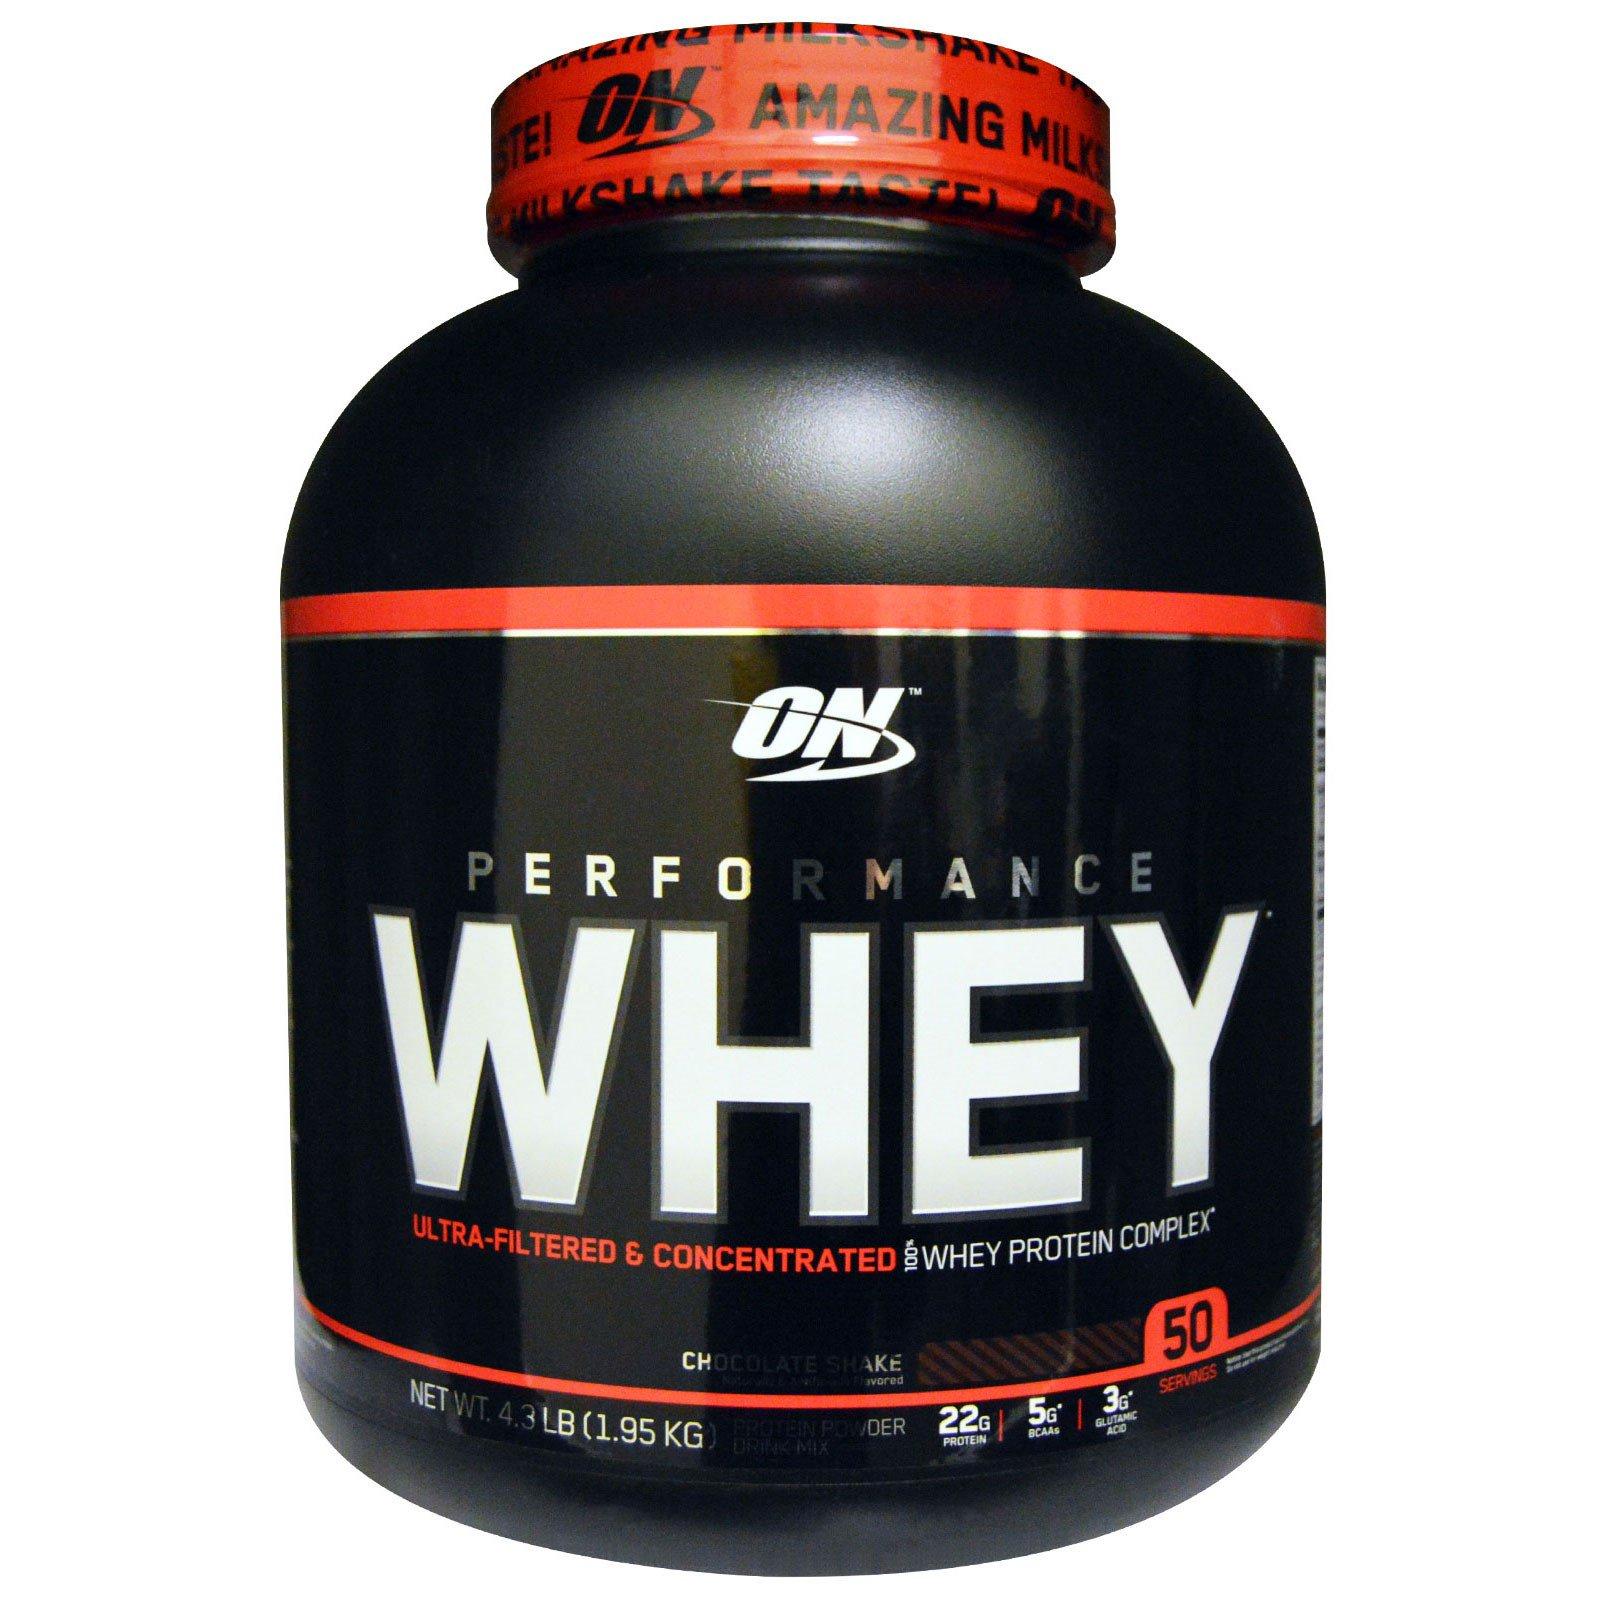 Optimum Nutrition, Performance Whey, шоколадный протеиновый коктейль, 4,3 фунта (1,95 кг)